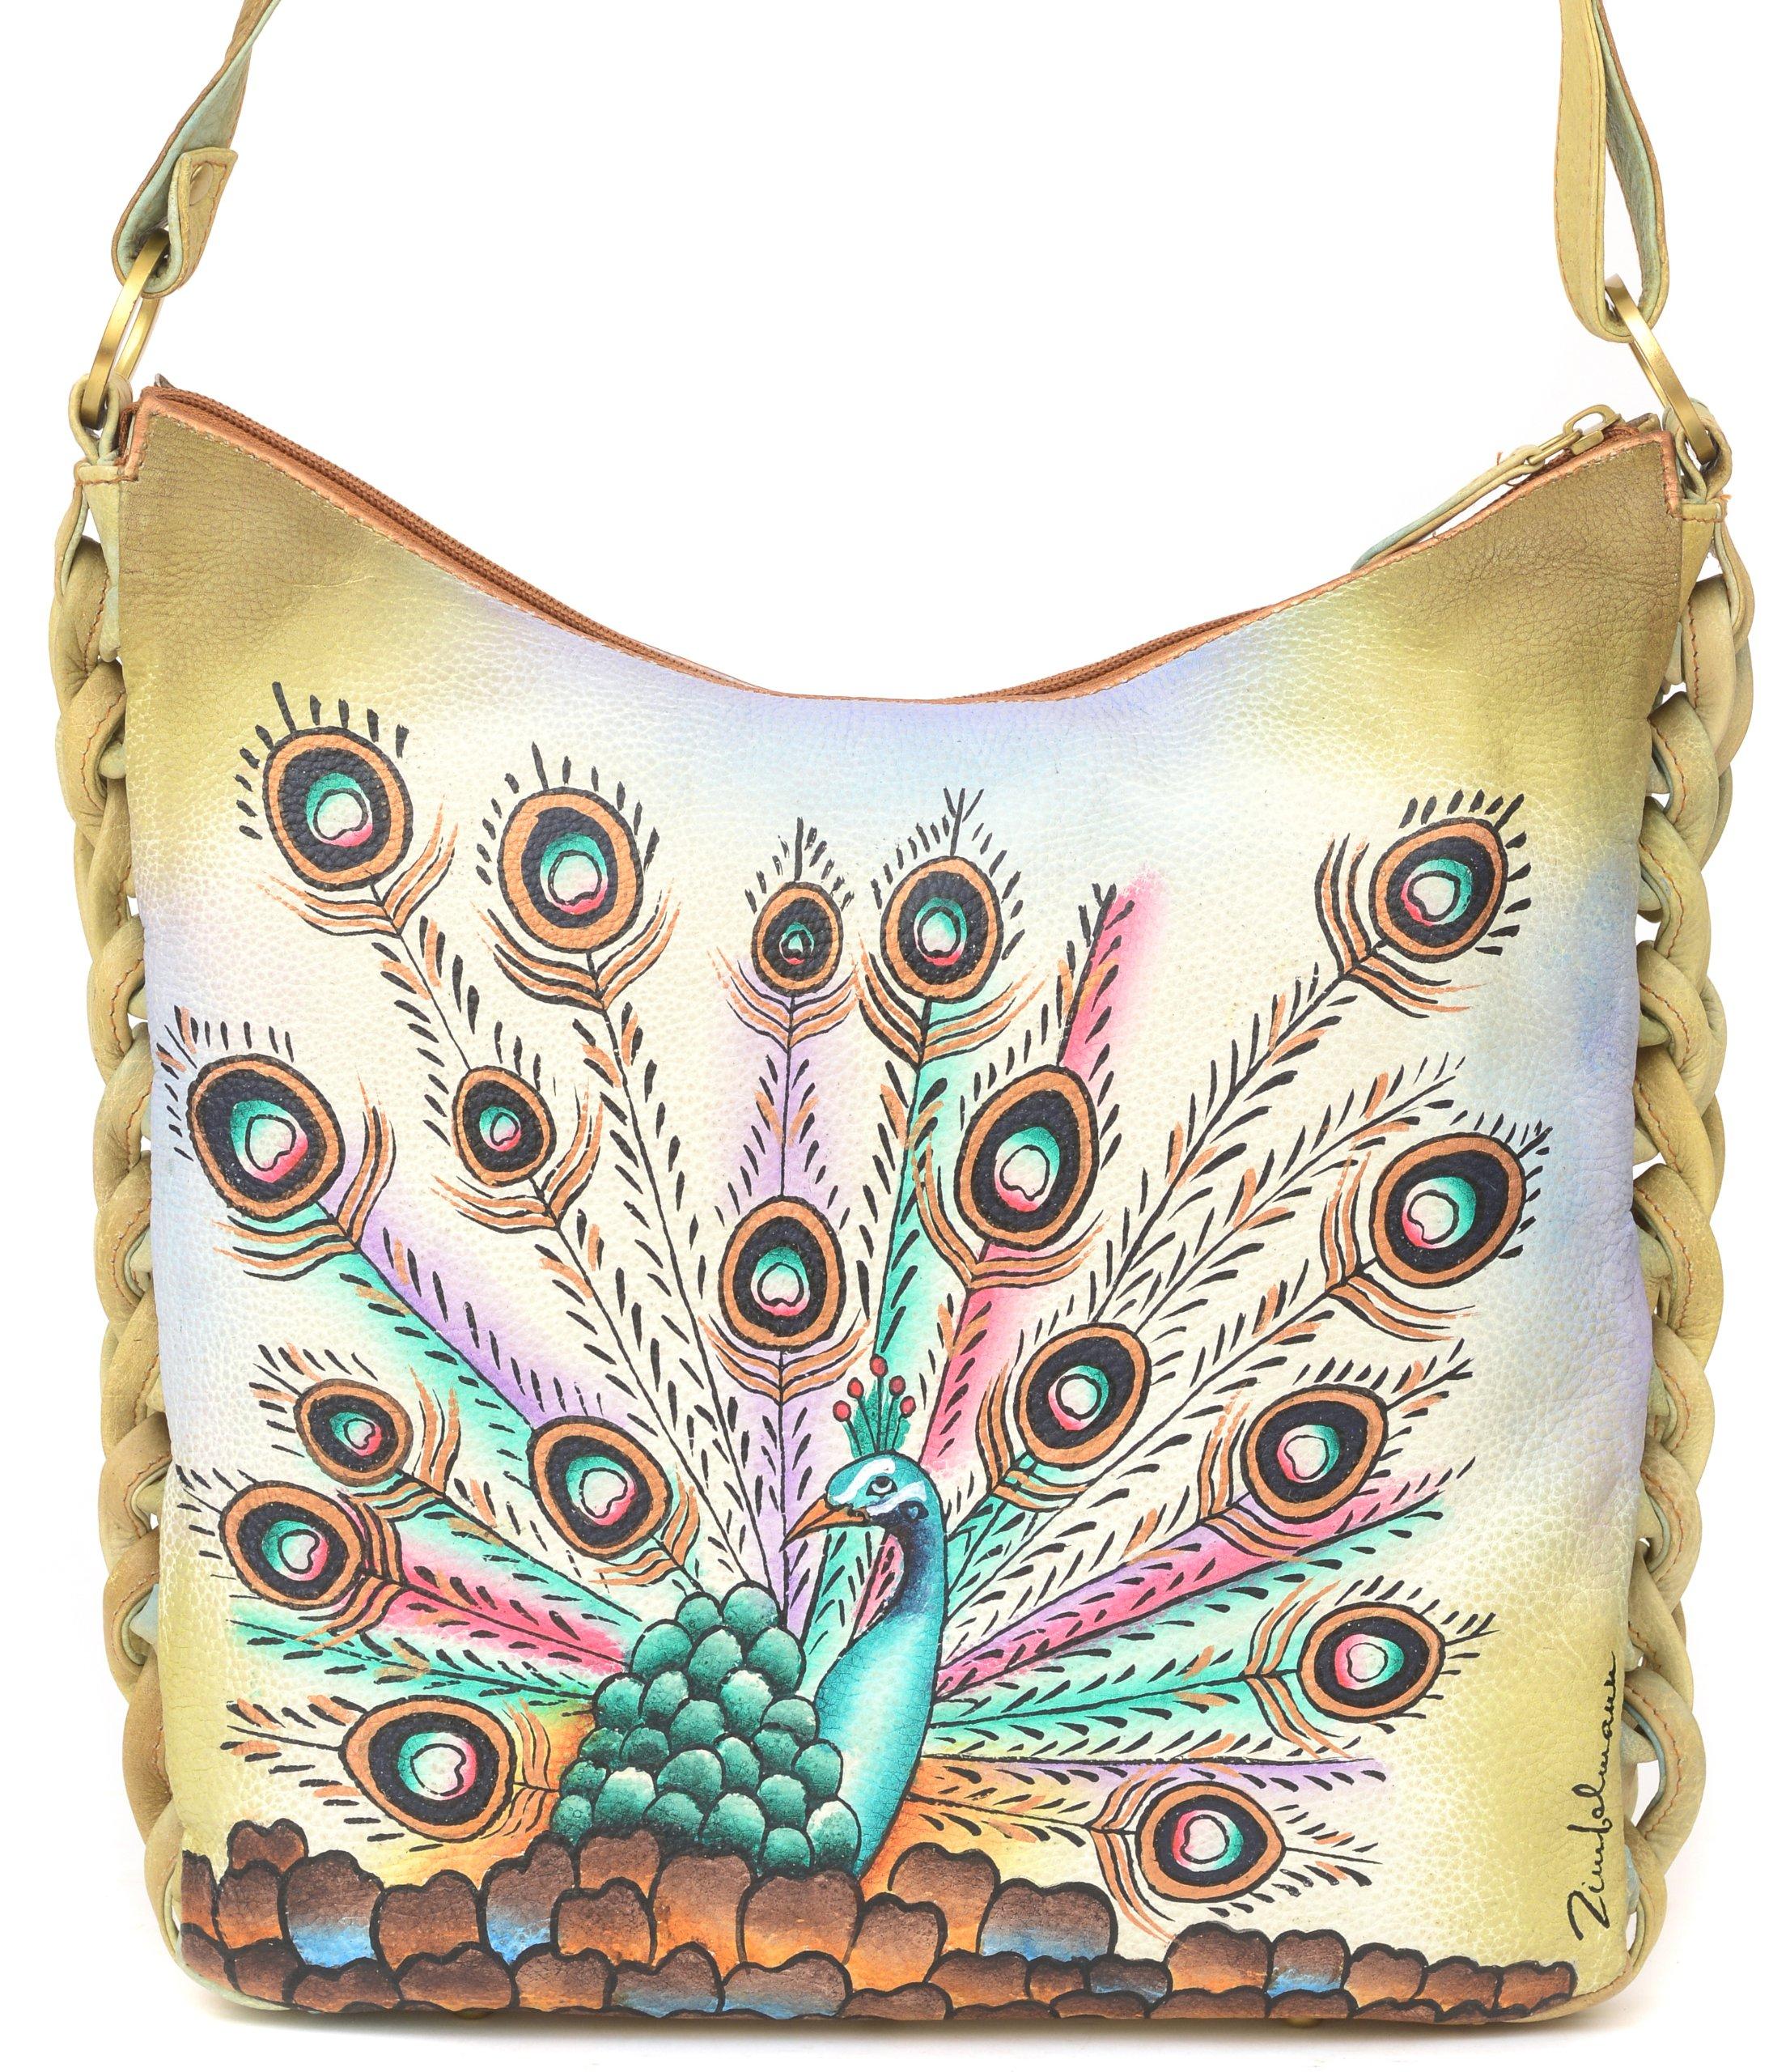 ZIMBELMANN BELLA Genuine Nappa Leather Hand-painted Hobo Shoulder Bag by Zimbelmann